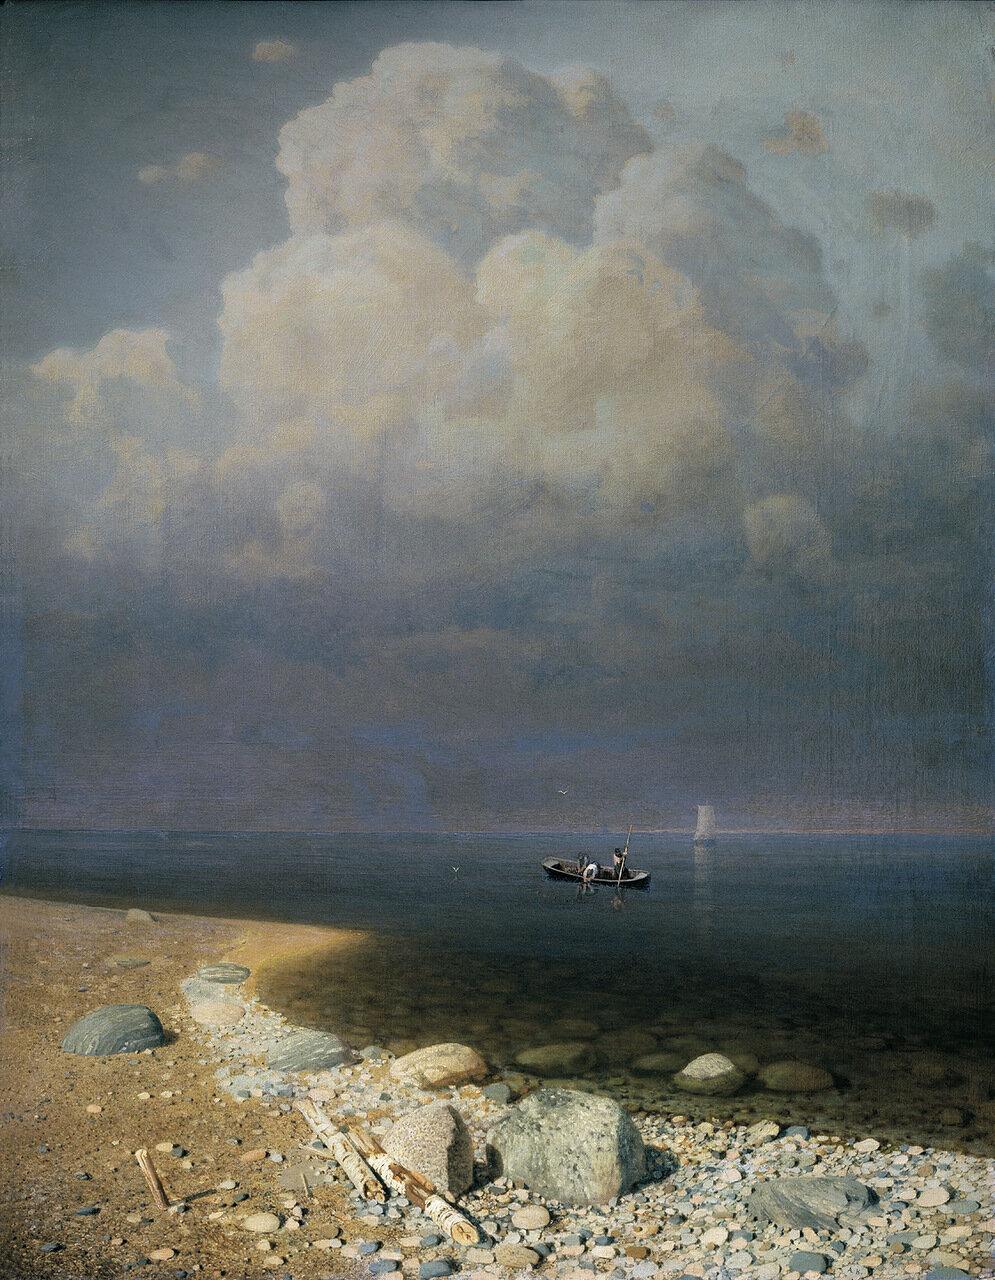 Ладожское озеро. 1870, холст, масло, 79,5х62,5 см.jpg